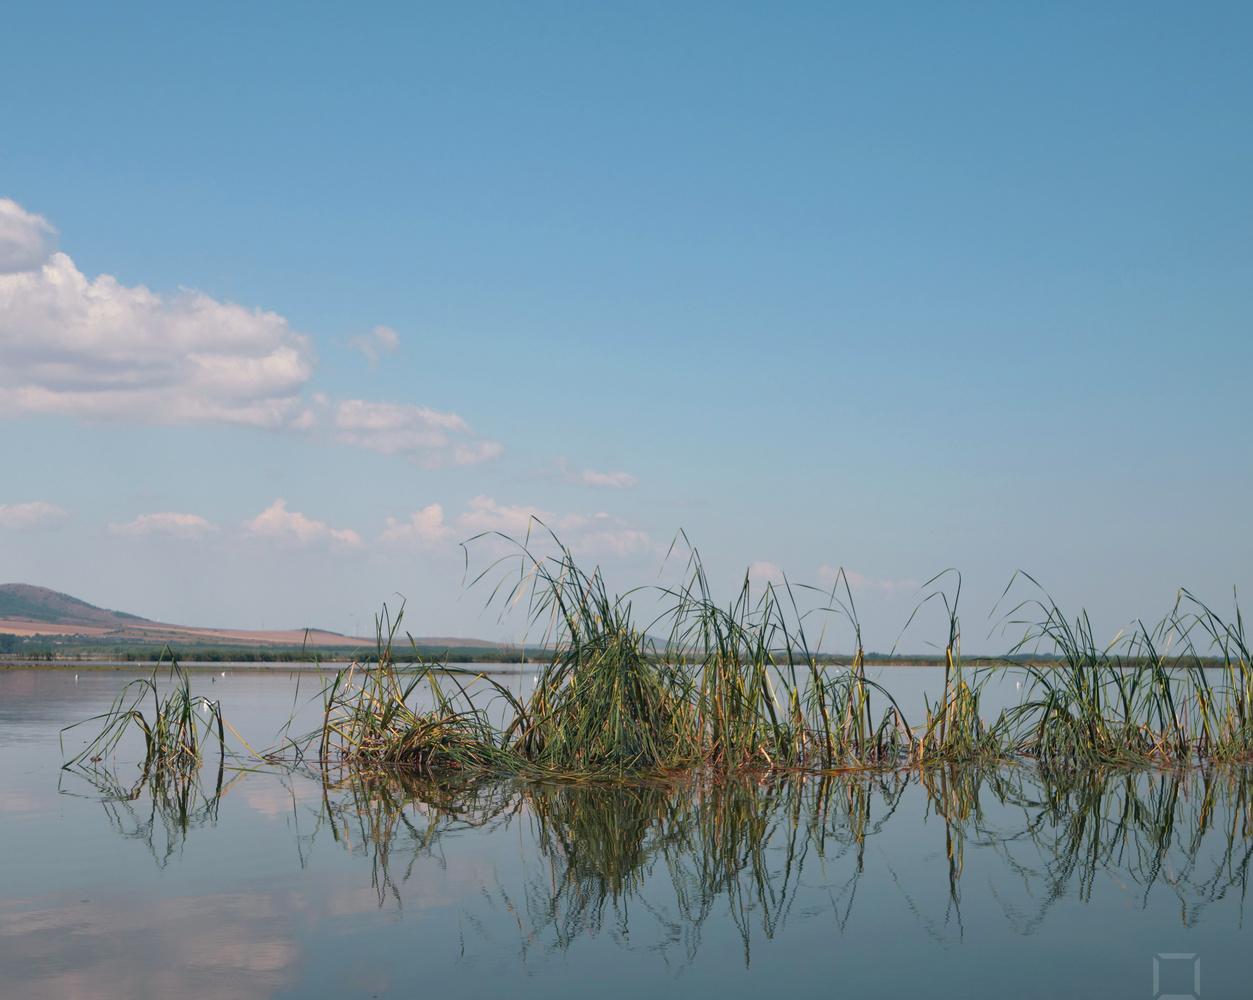 Danube Canals by Toma Popescu